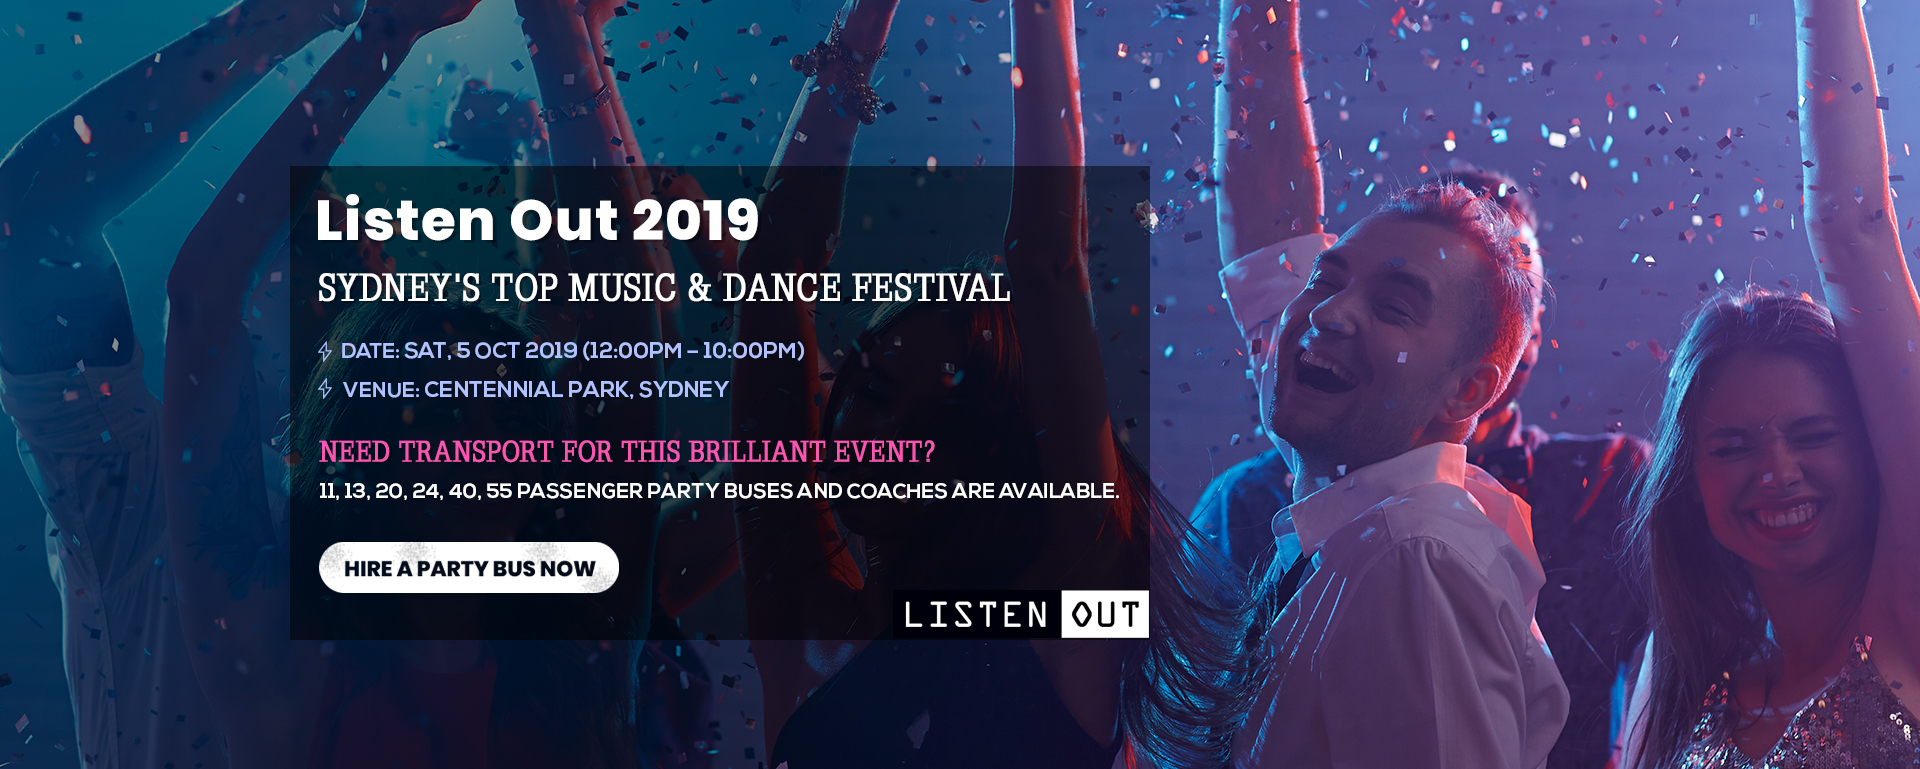 Listen Out 2019